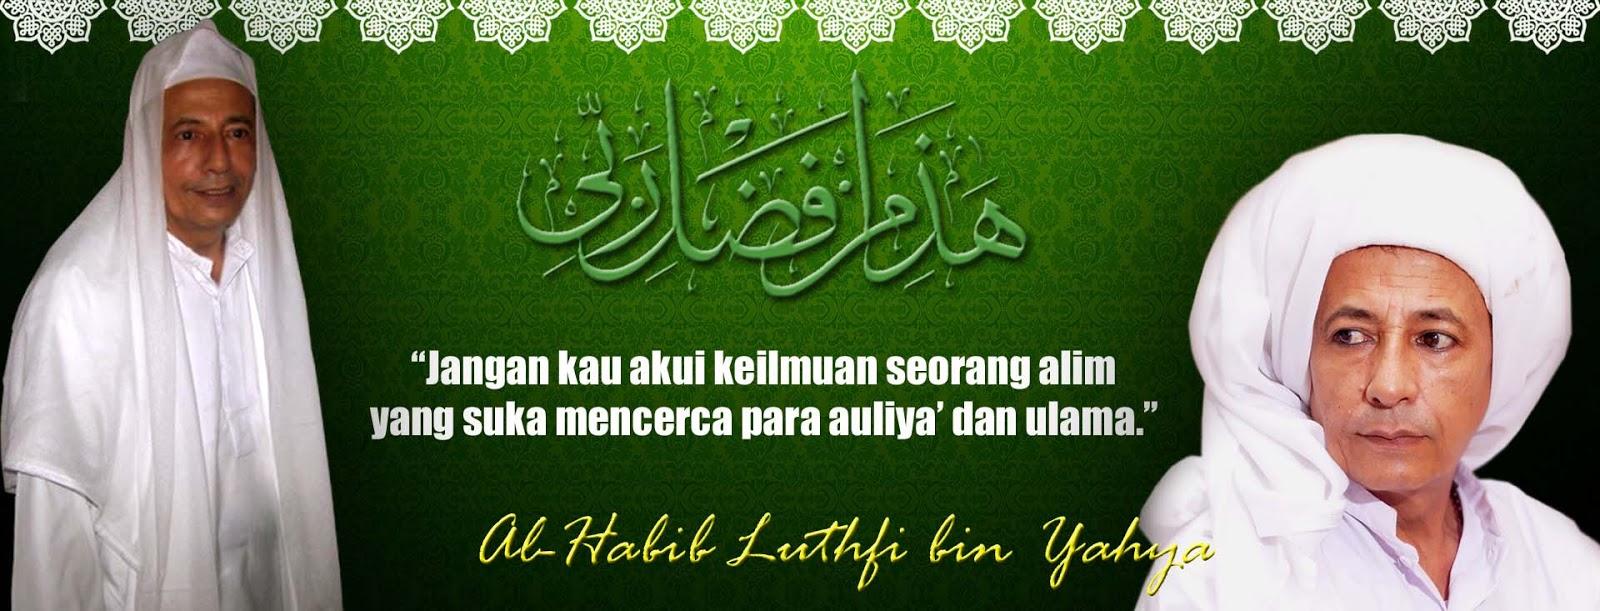 Kata Hikmah Ulama Sufi Cikimmcom